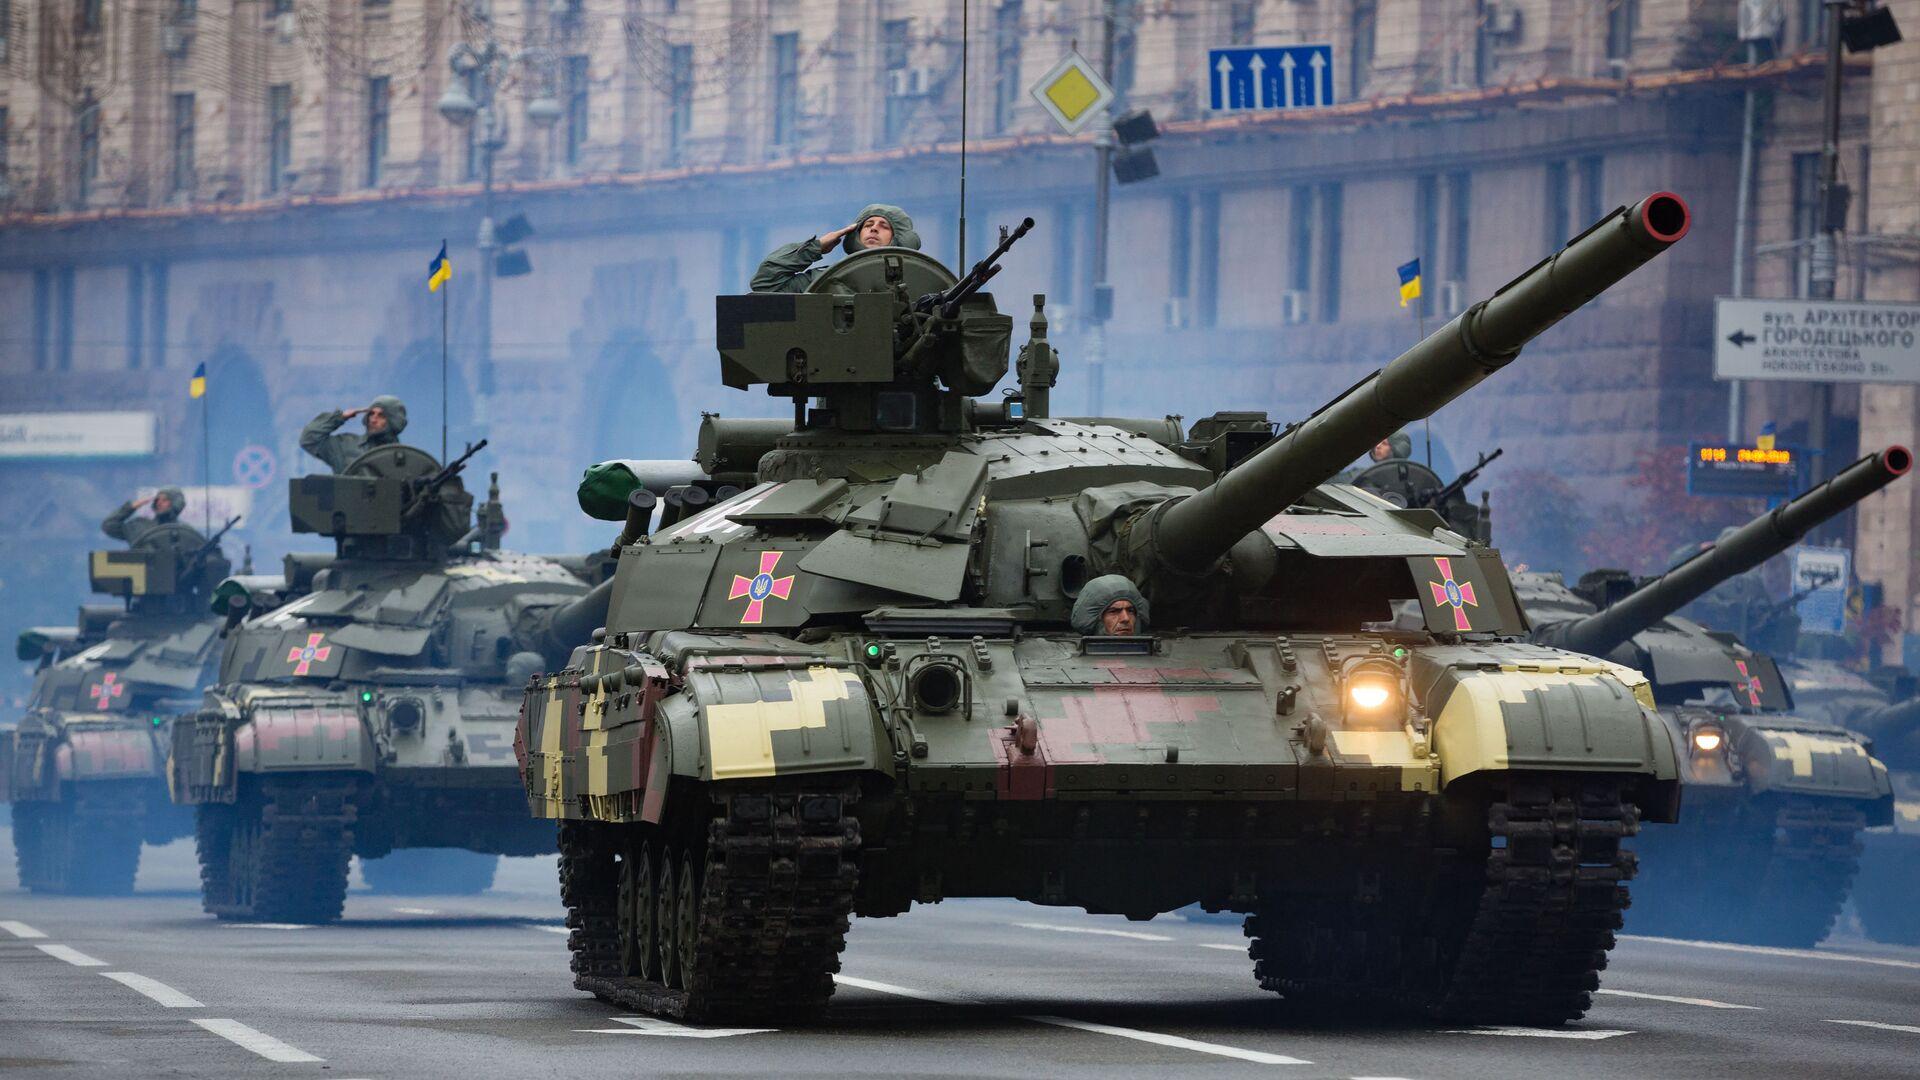 Ukrajinki tenk T-64M Bulat  - Sputnik Srbija, 1920, 16.09.2021